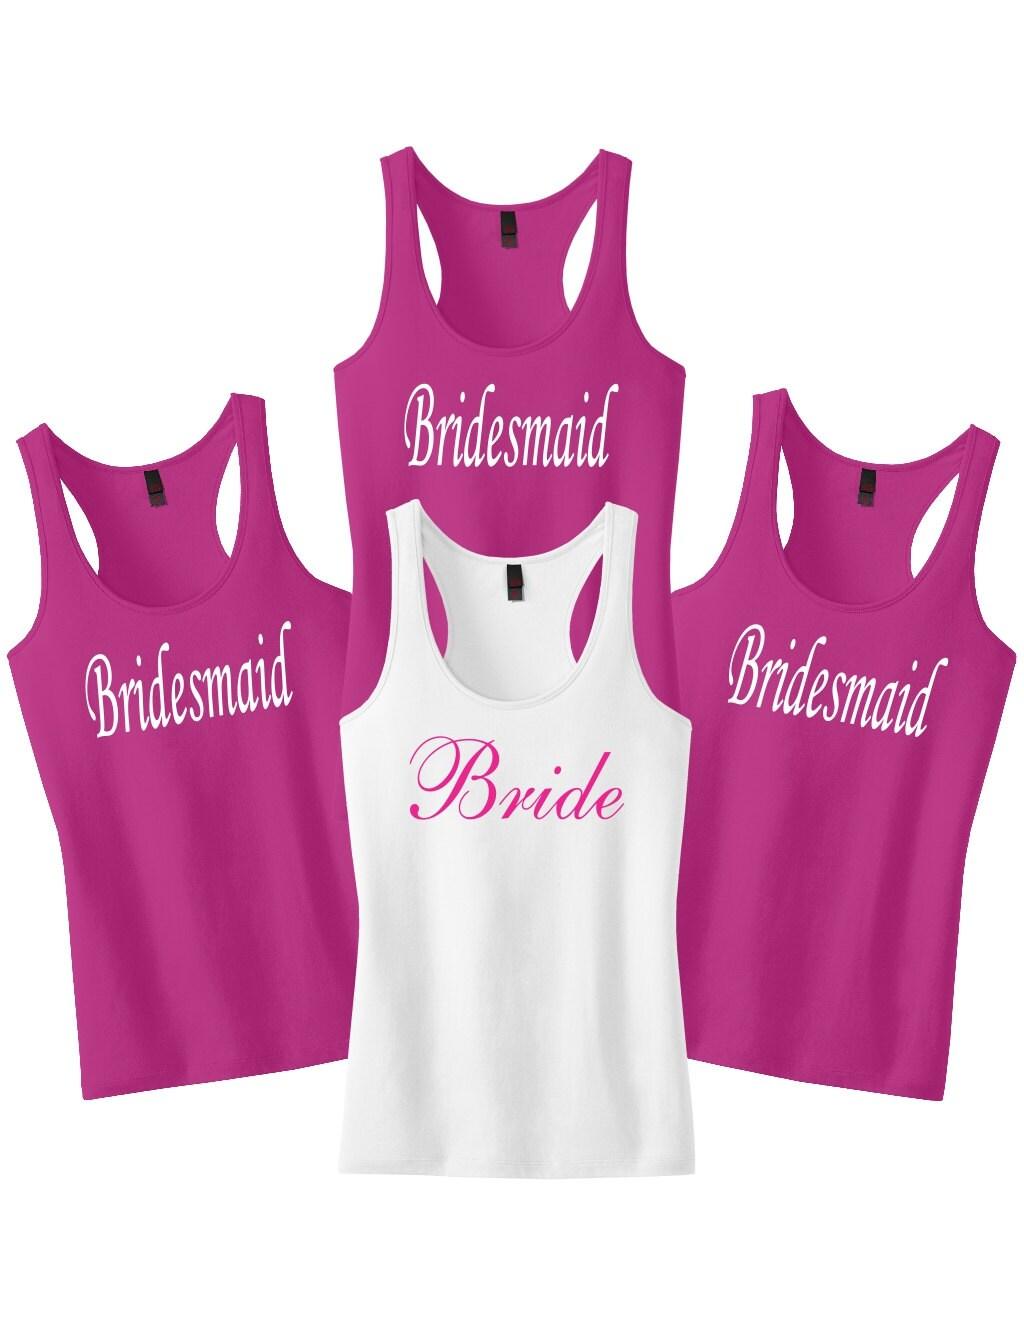 Bridesmaid Shirts Bachelorette Party Tank Tops Gift Wedding Maid Of Honor Bride Top Shirt